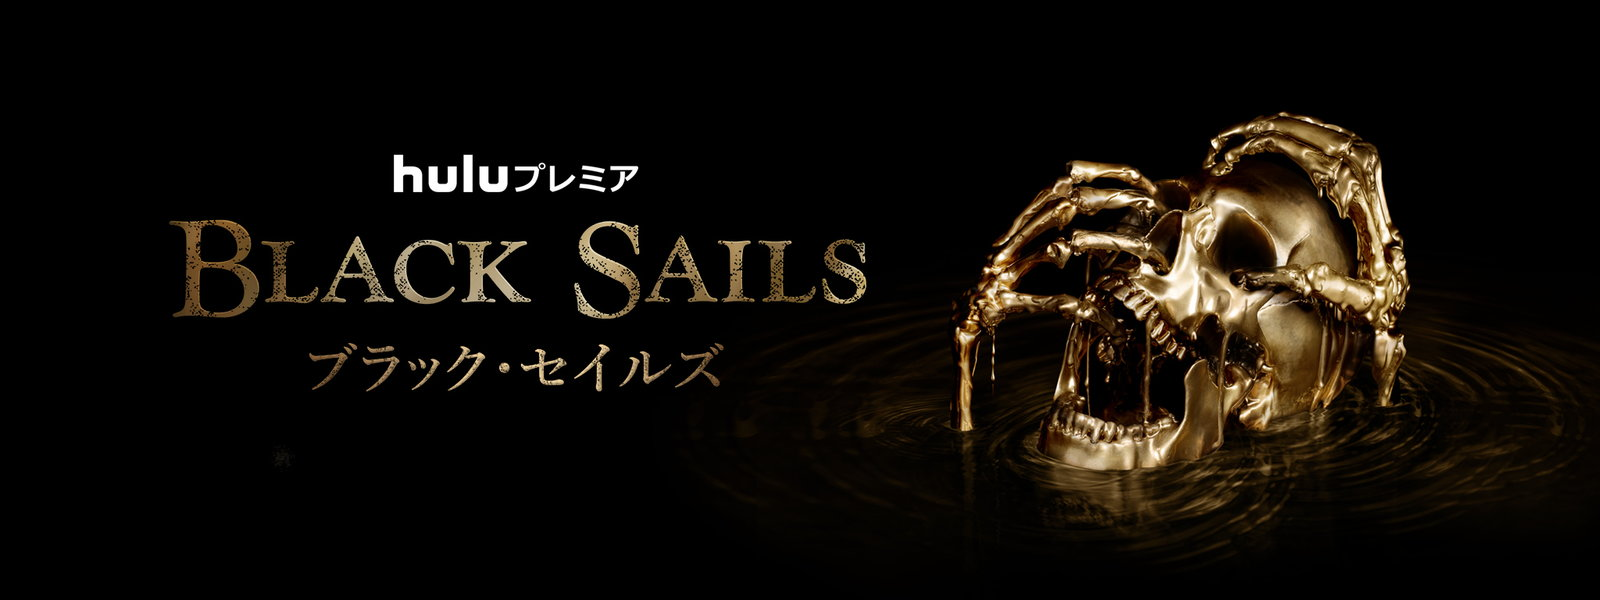 Black Sails/ブラック・セイルズ シーズン4 動画